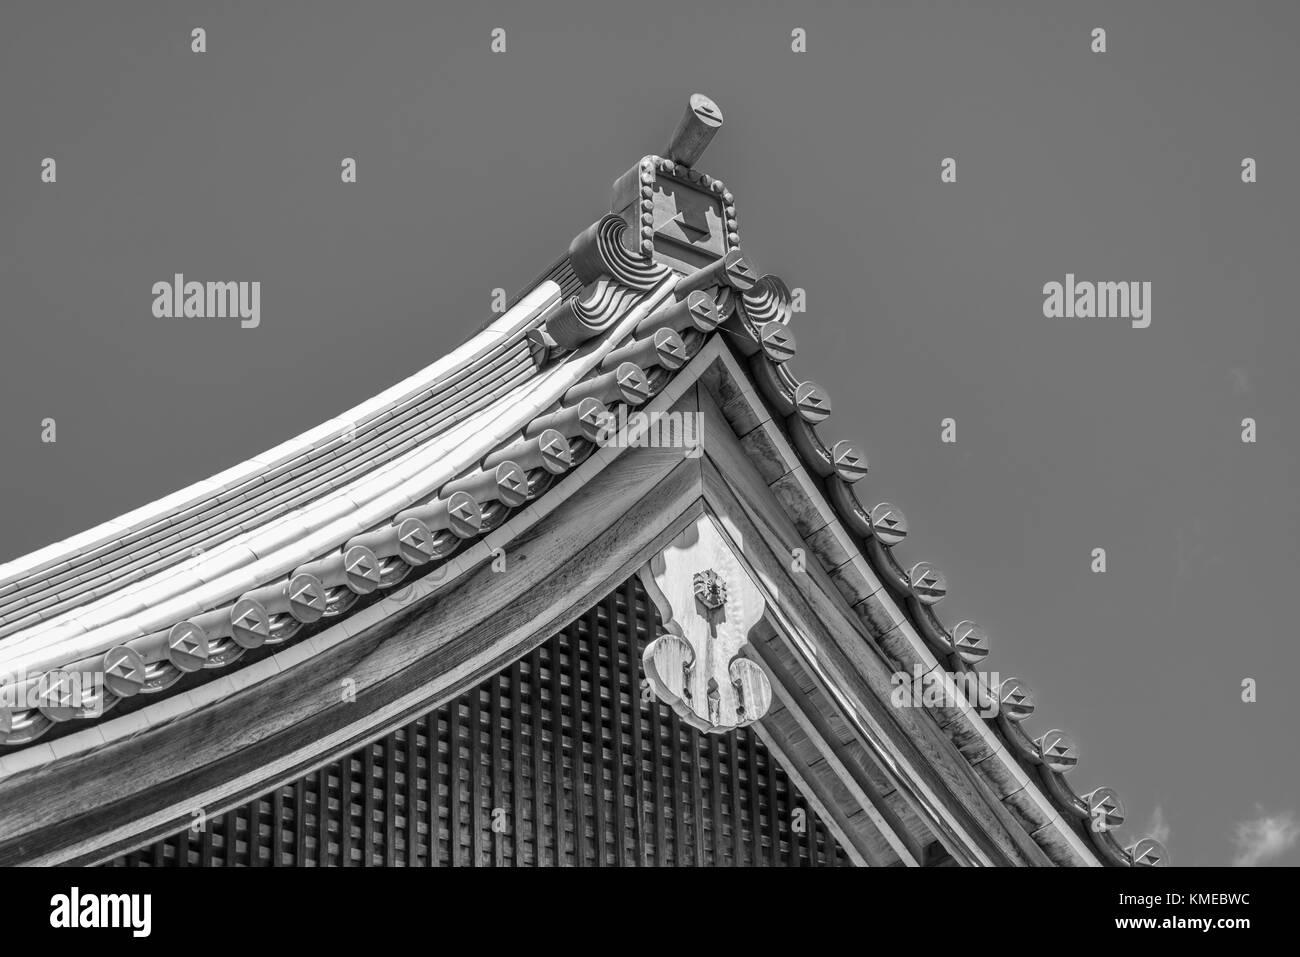 Roof ornaments of Butsuden Hall or Main Hall of Engaku-ji Zen Buddhist temple complex. Kamakura, Kanagawa Prefecture, - Stock Image